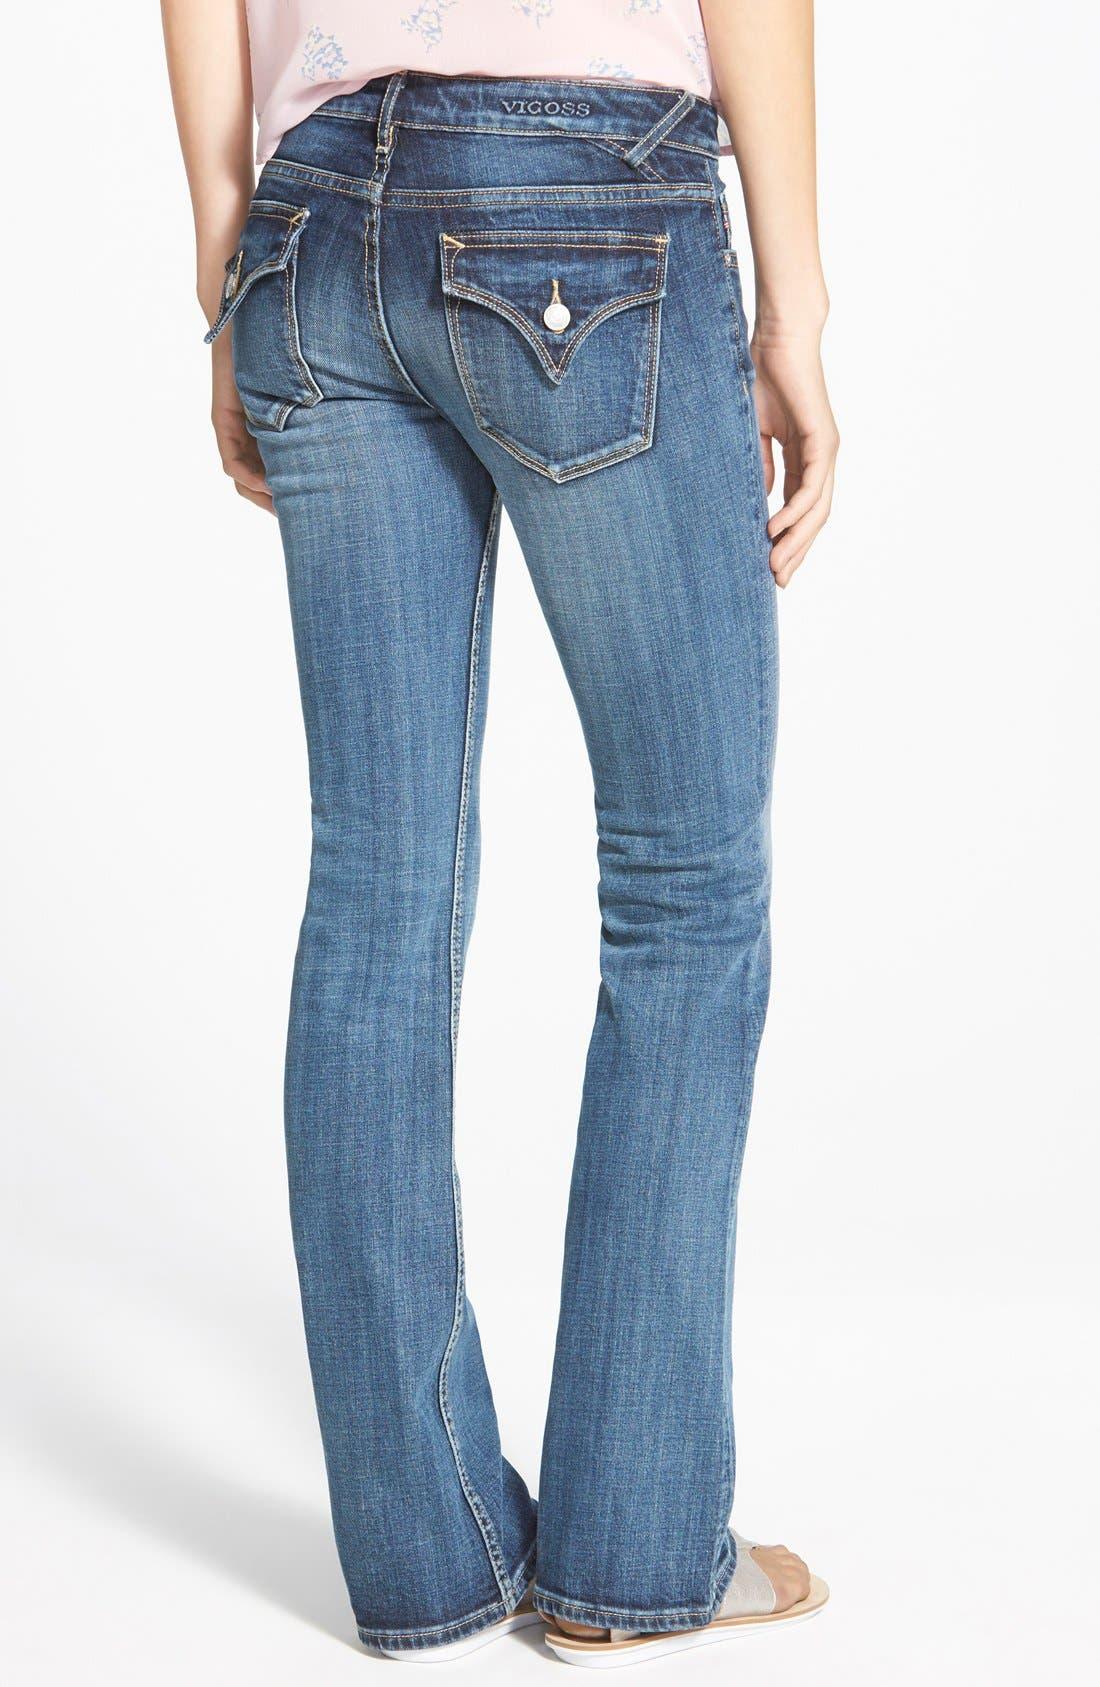 Alternate Image 2  - Vigoss 'NY' Bootcut Jeans (Dark Wash)